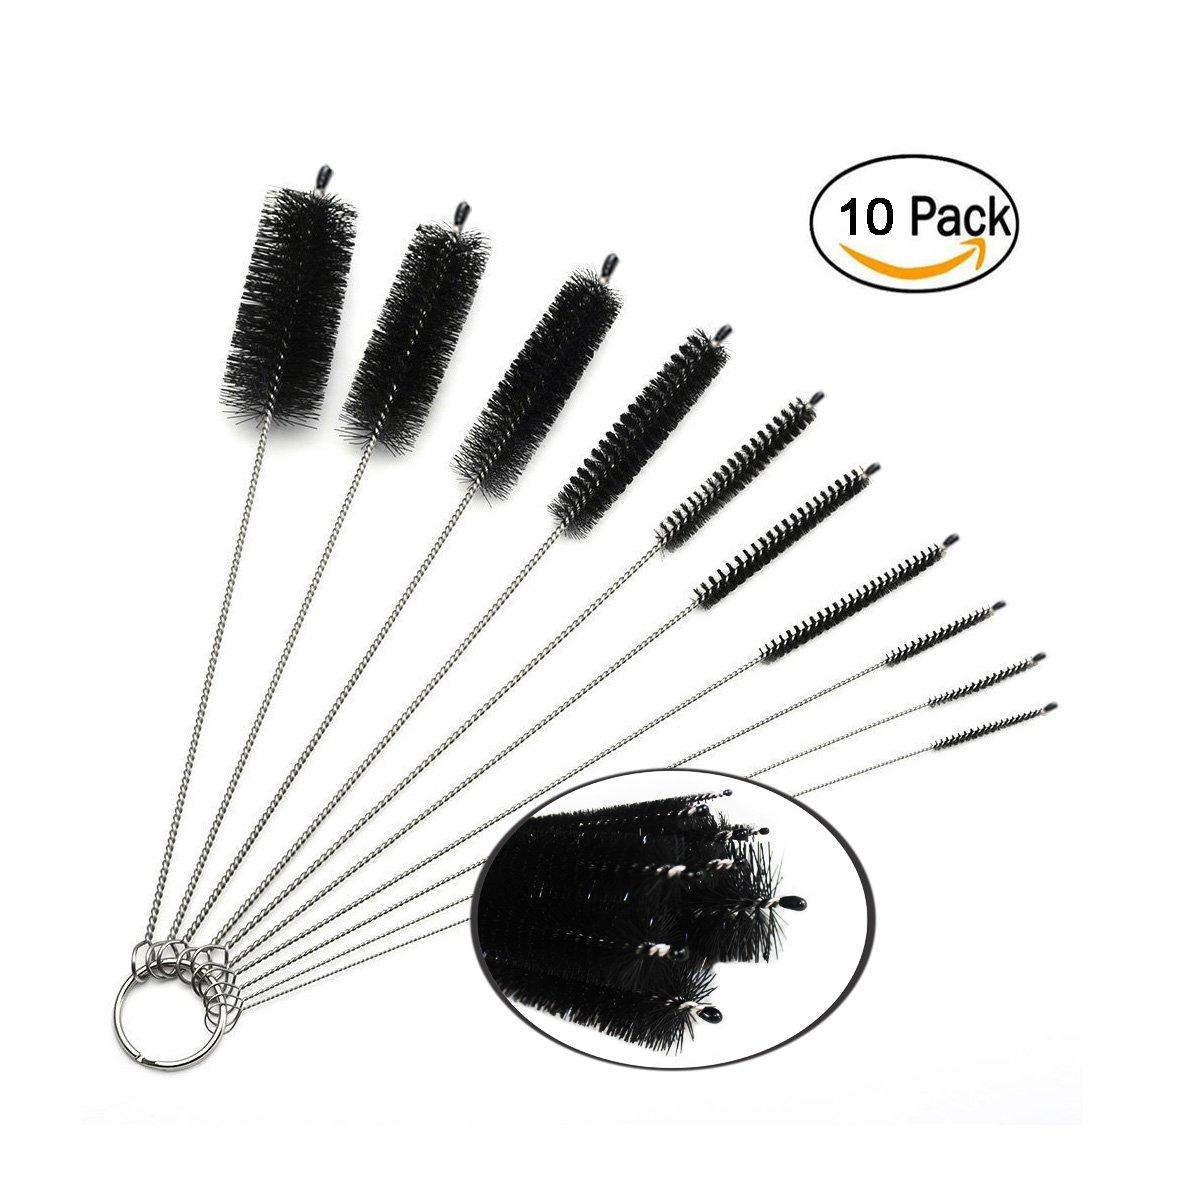 Boocy 10 PCS Nylon Pipe Brush Tube Brush Glasses Straw Cleaning Brush Set,Black